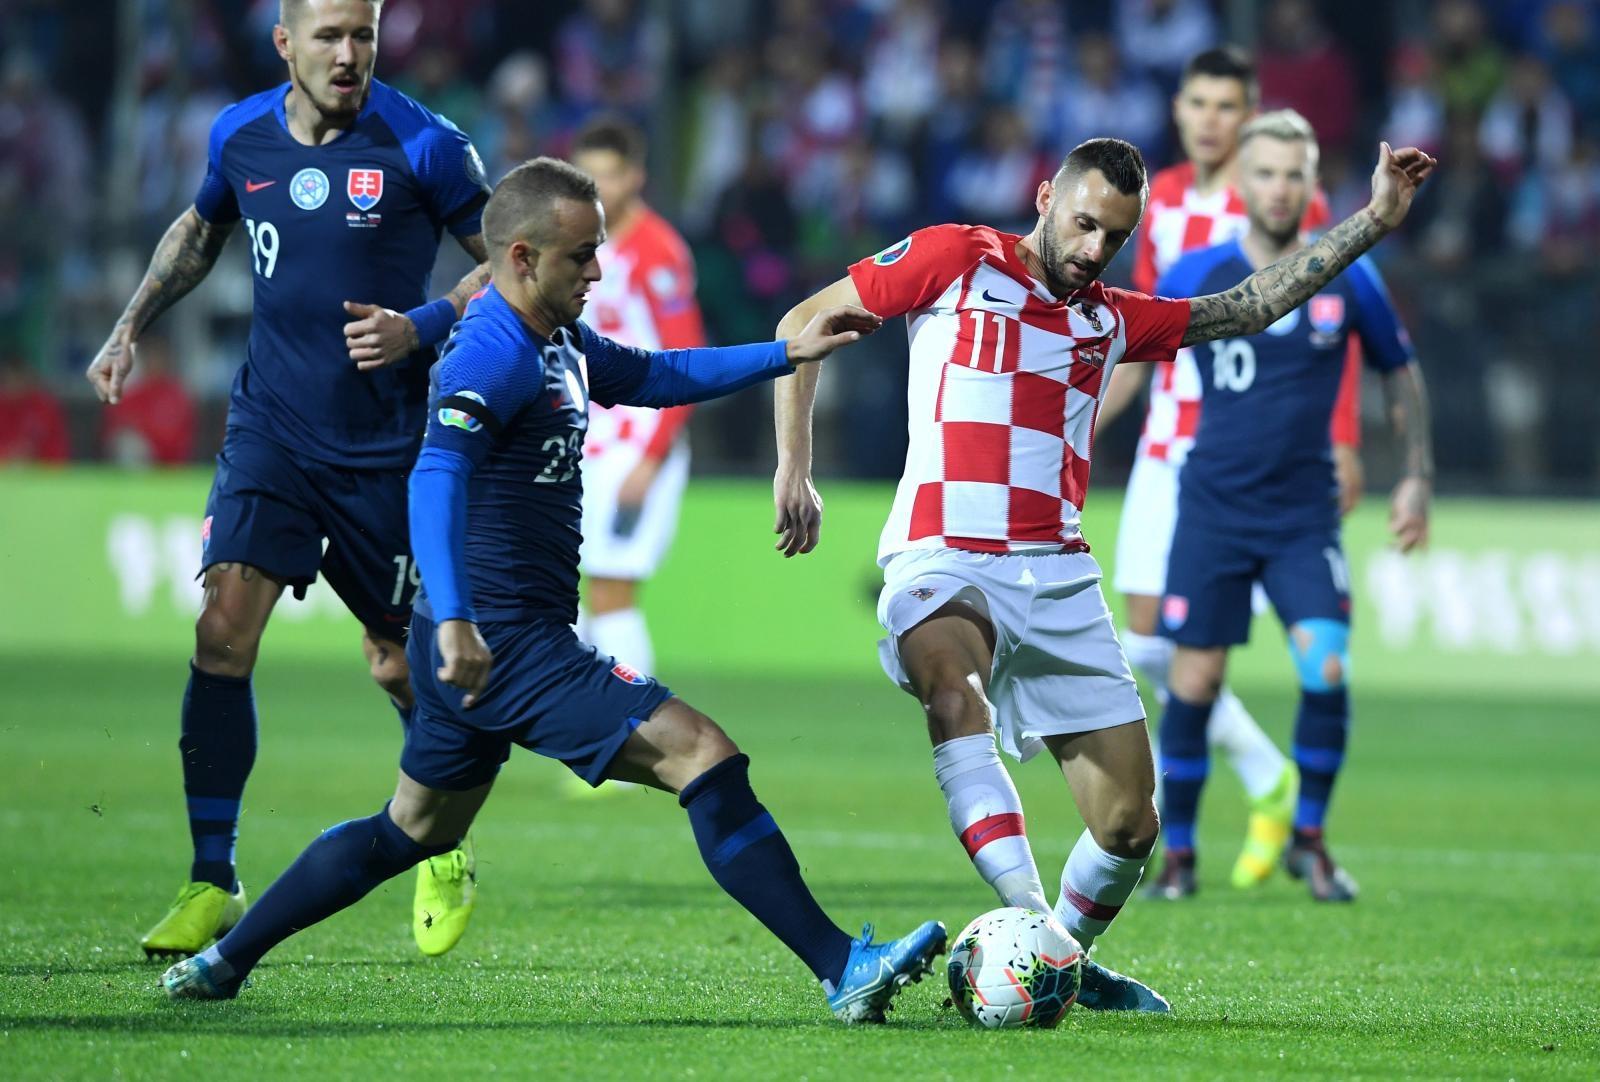 Hrvatska pobjedom na Rujevici osigurala Europsko prvenstvo